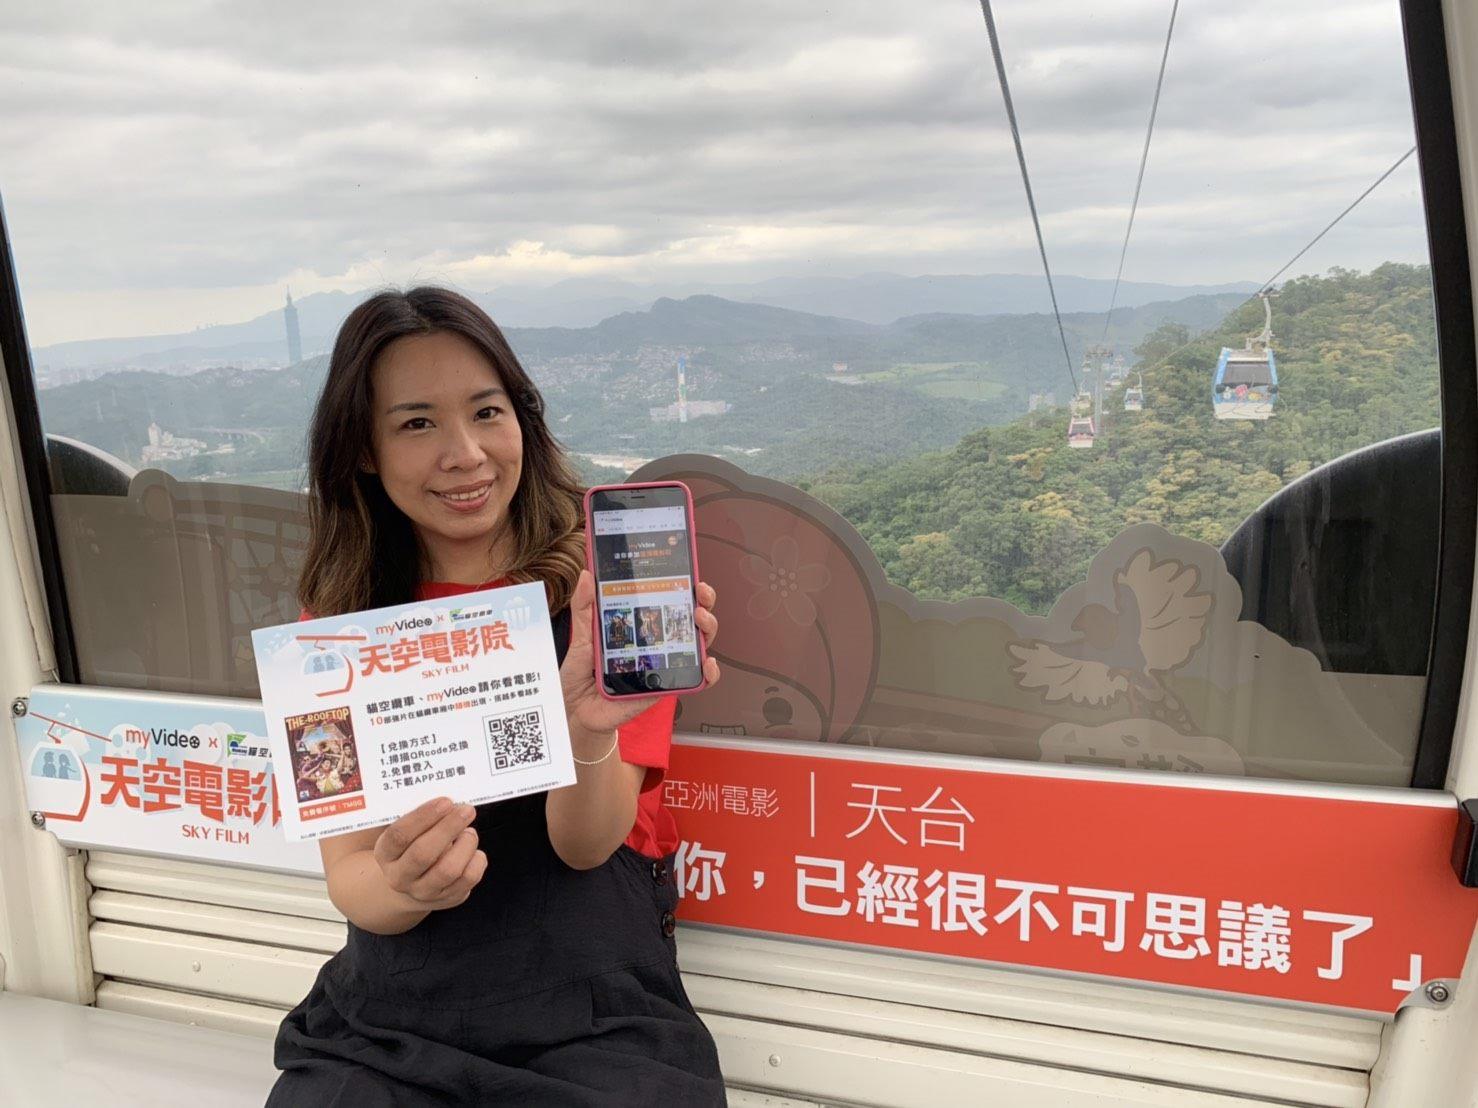 Take the Maokong Gondola and enjoy a free movie!